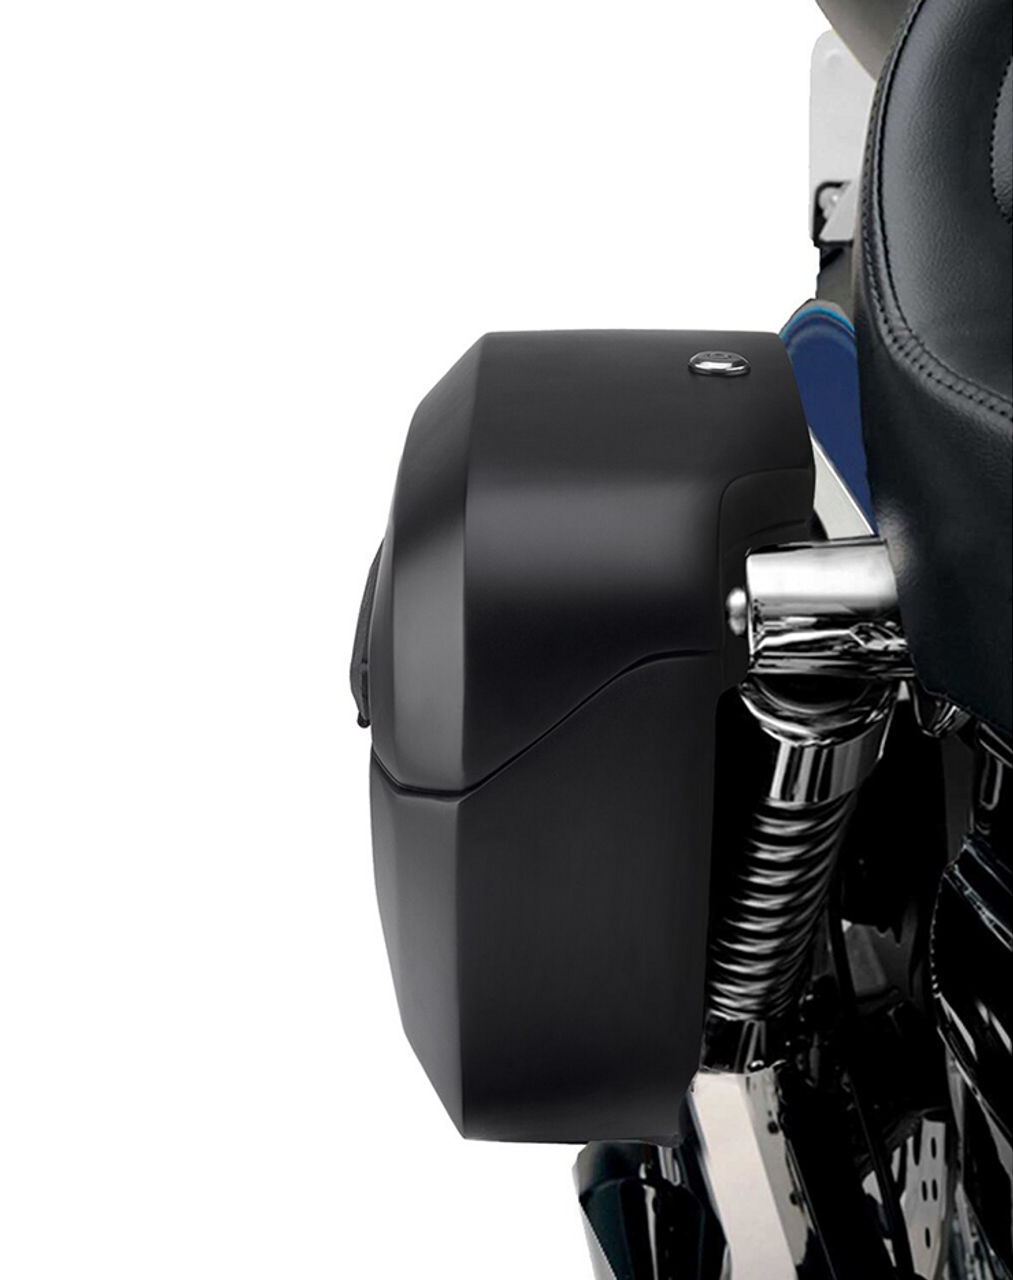 Viking Lamellar Shock Cutout Large Matte Motorcycle Hard Saddlebags For Honda VTX 1800 F Shock Cutout View